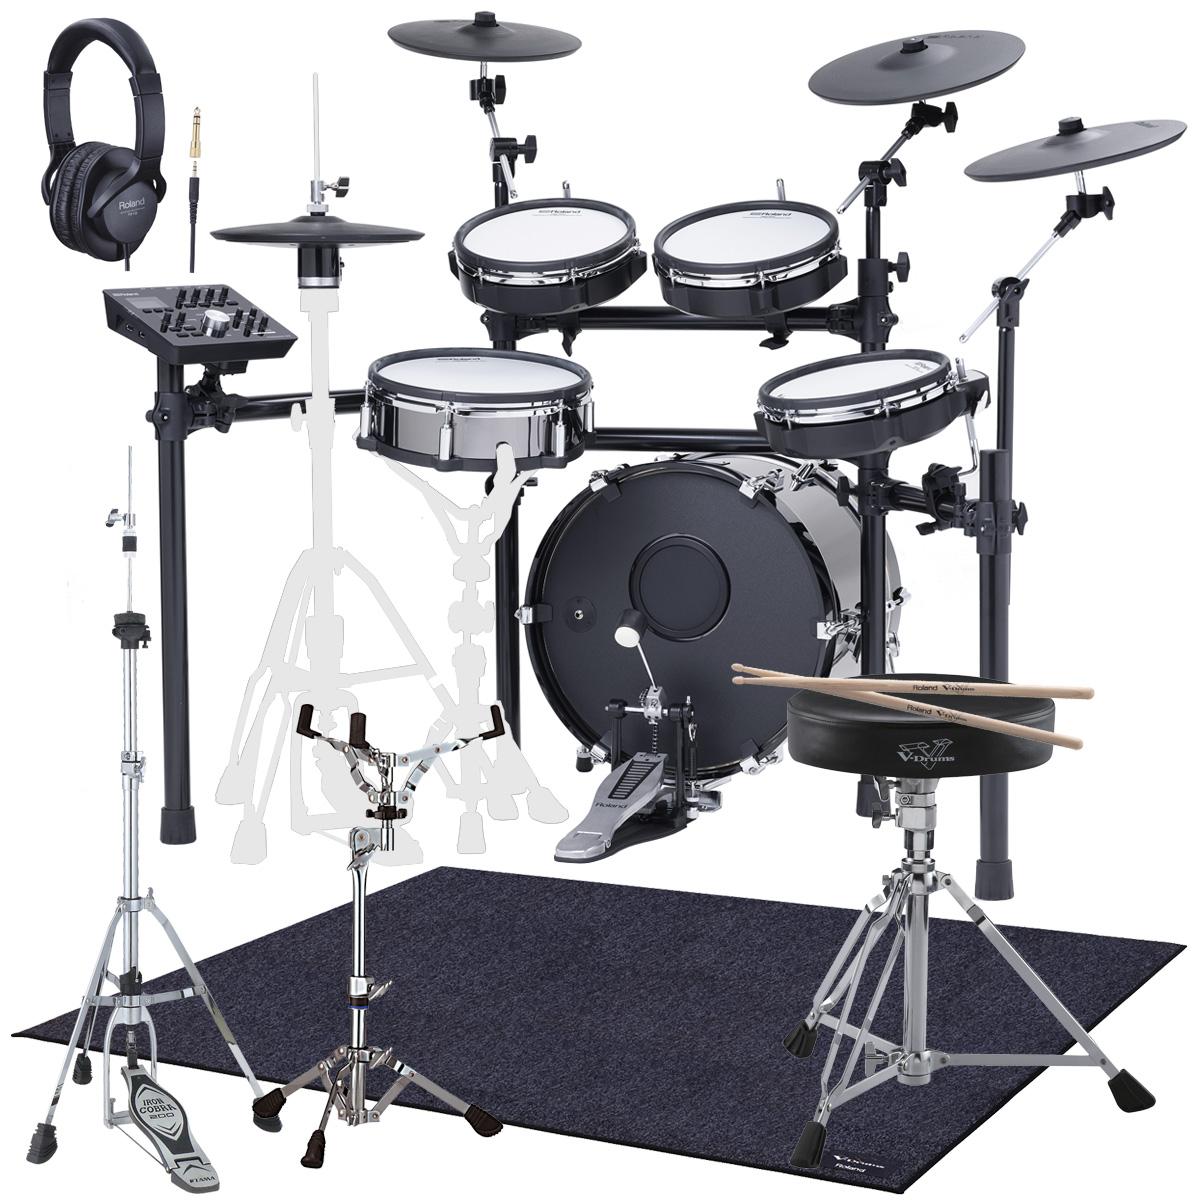 【Rolandキャッシュバック10000円対象】Roland Drum System TD-25KVX KD-180 MDS-STD スターターパック マット付き【YRK】